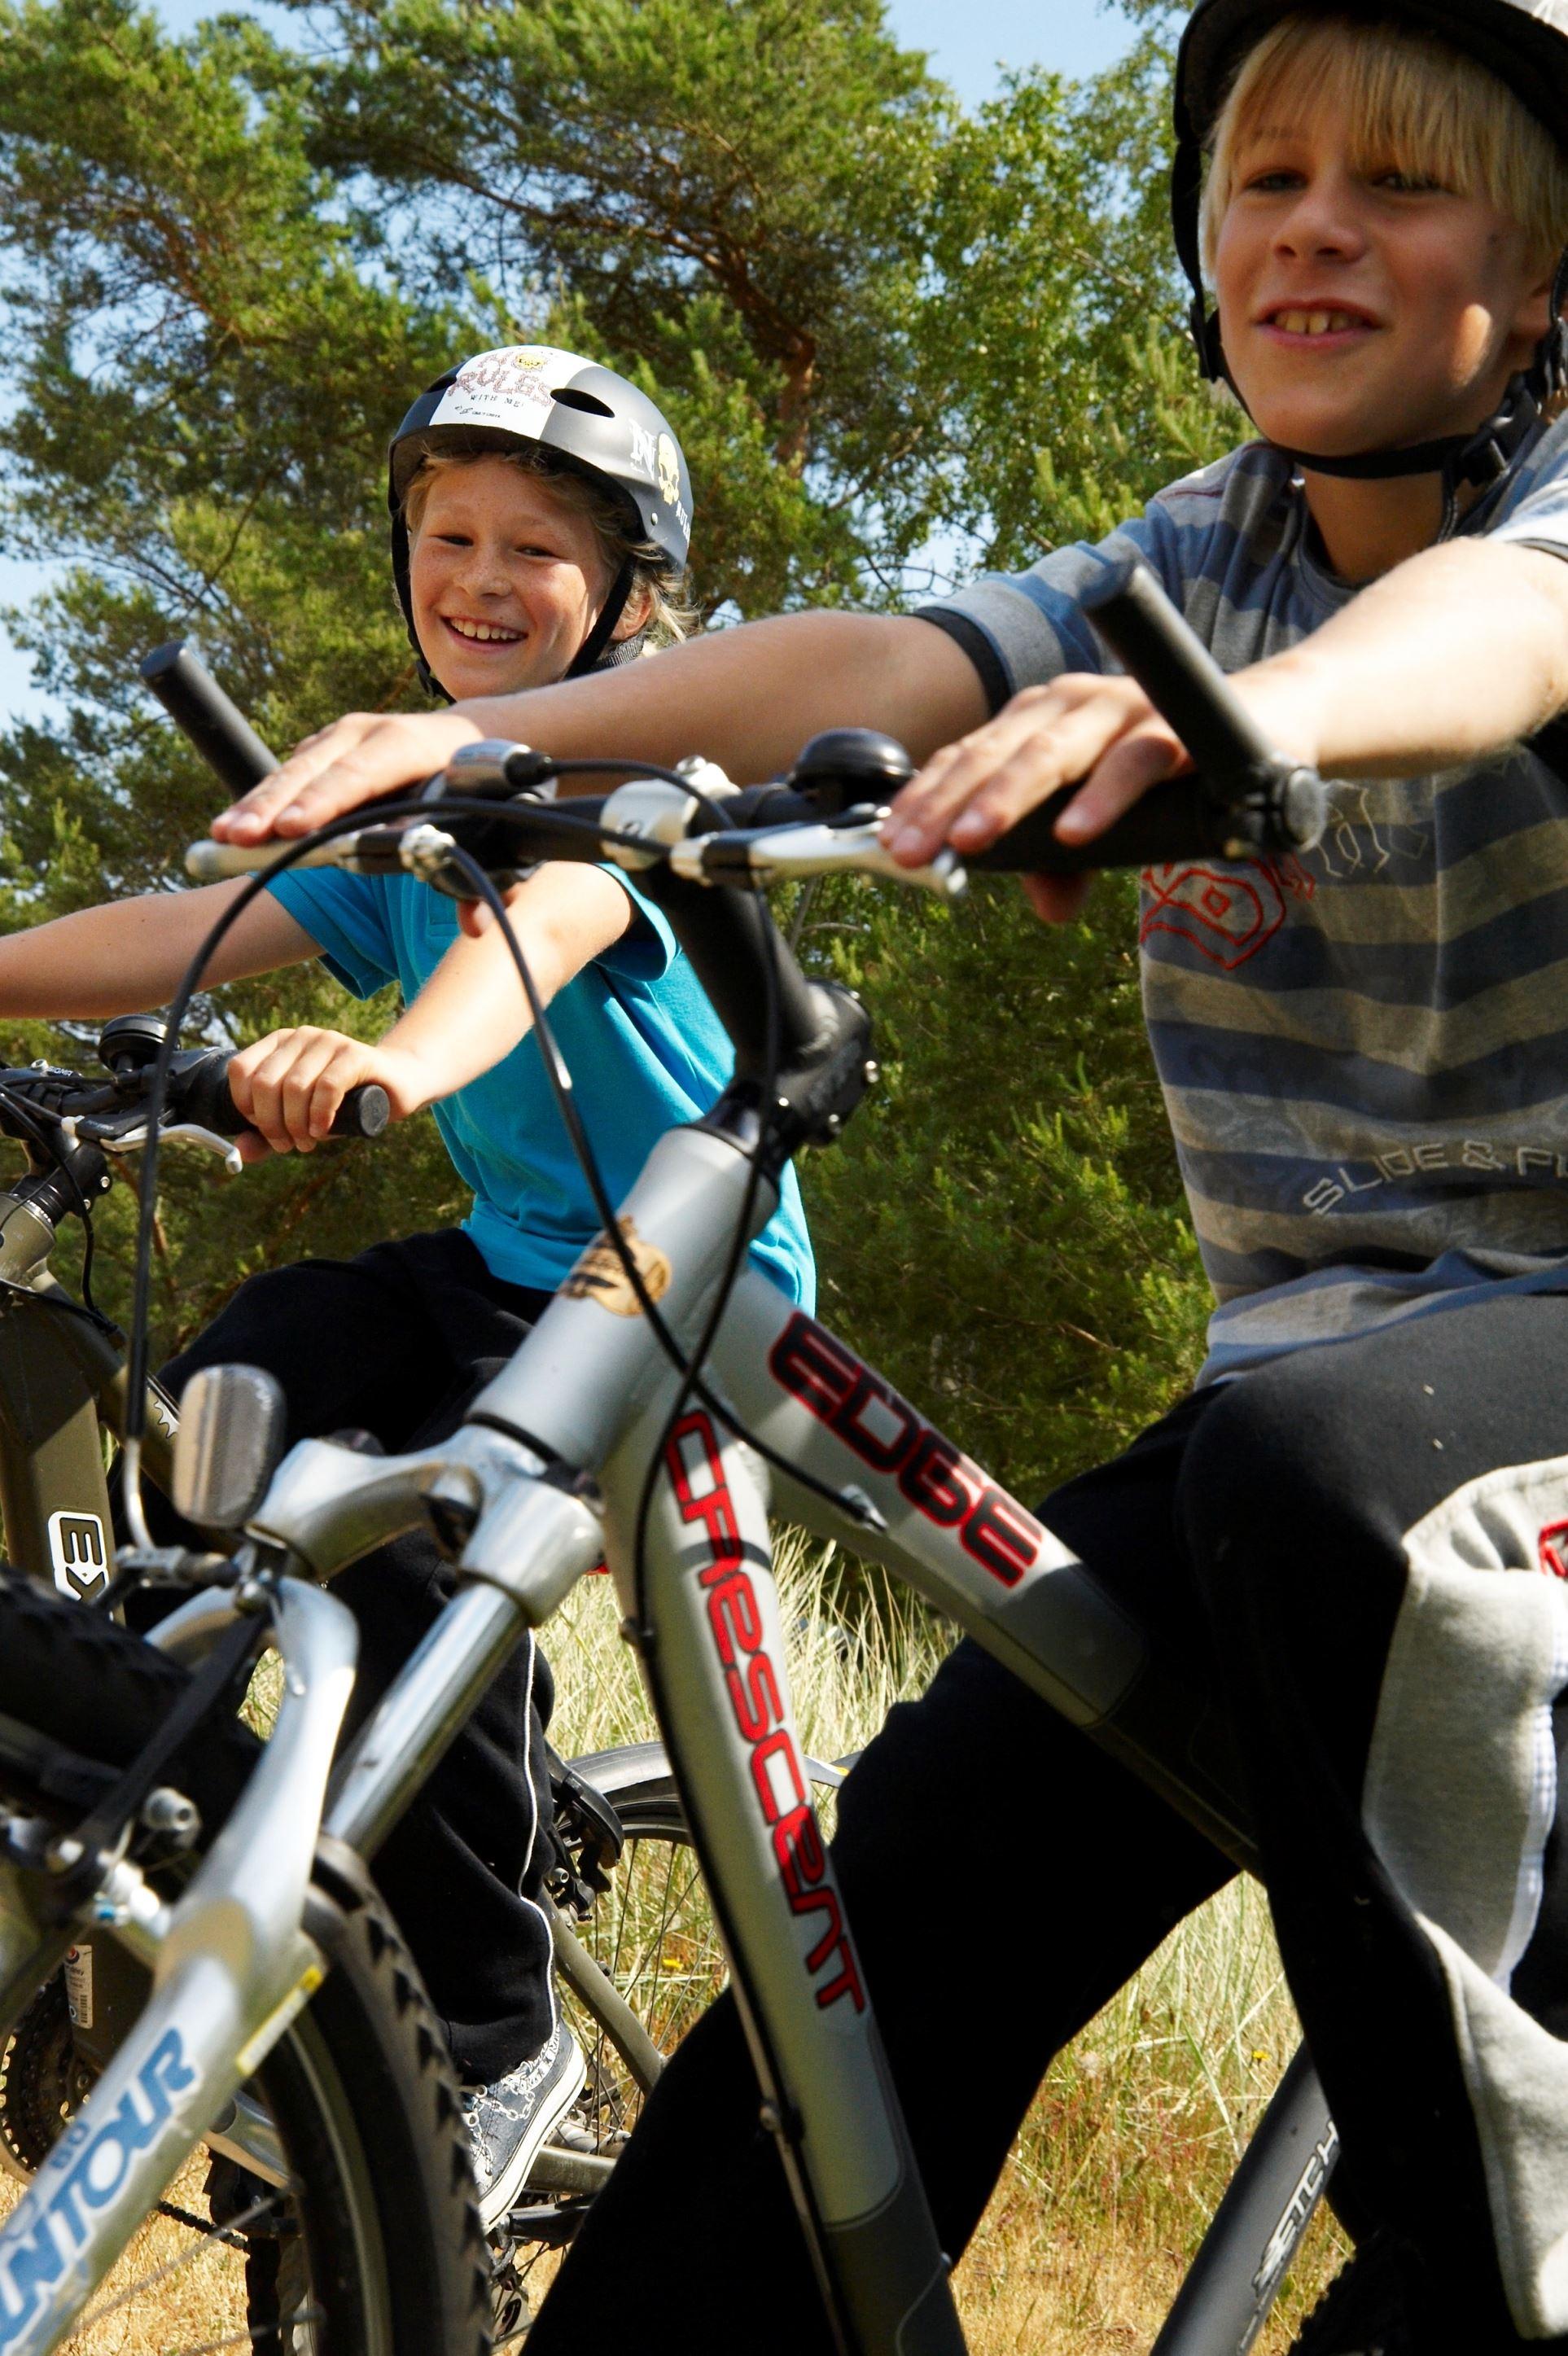 Bike rental - Cykelcentralen AB